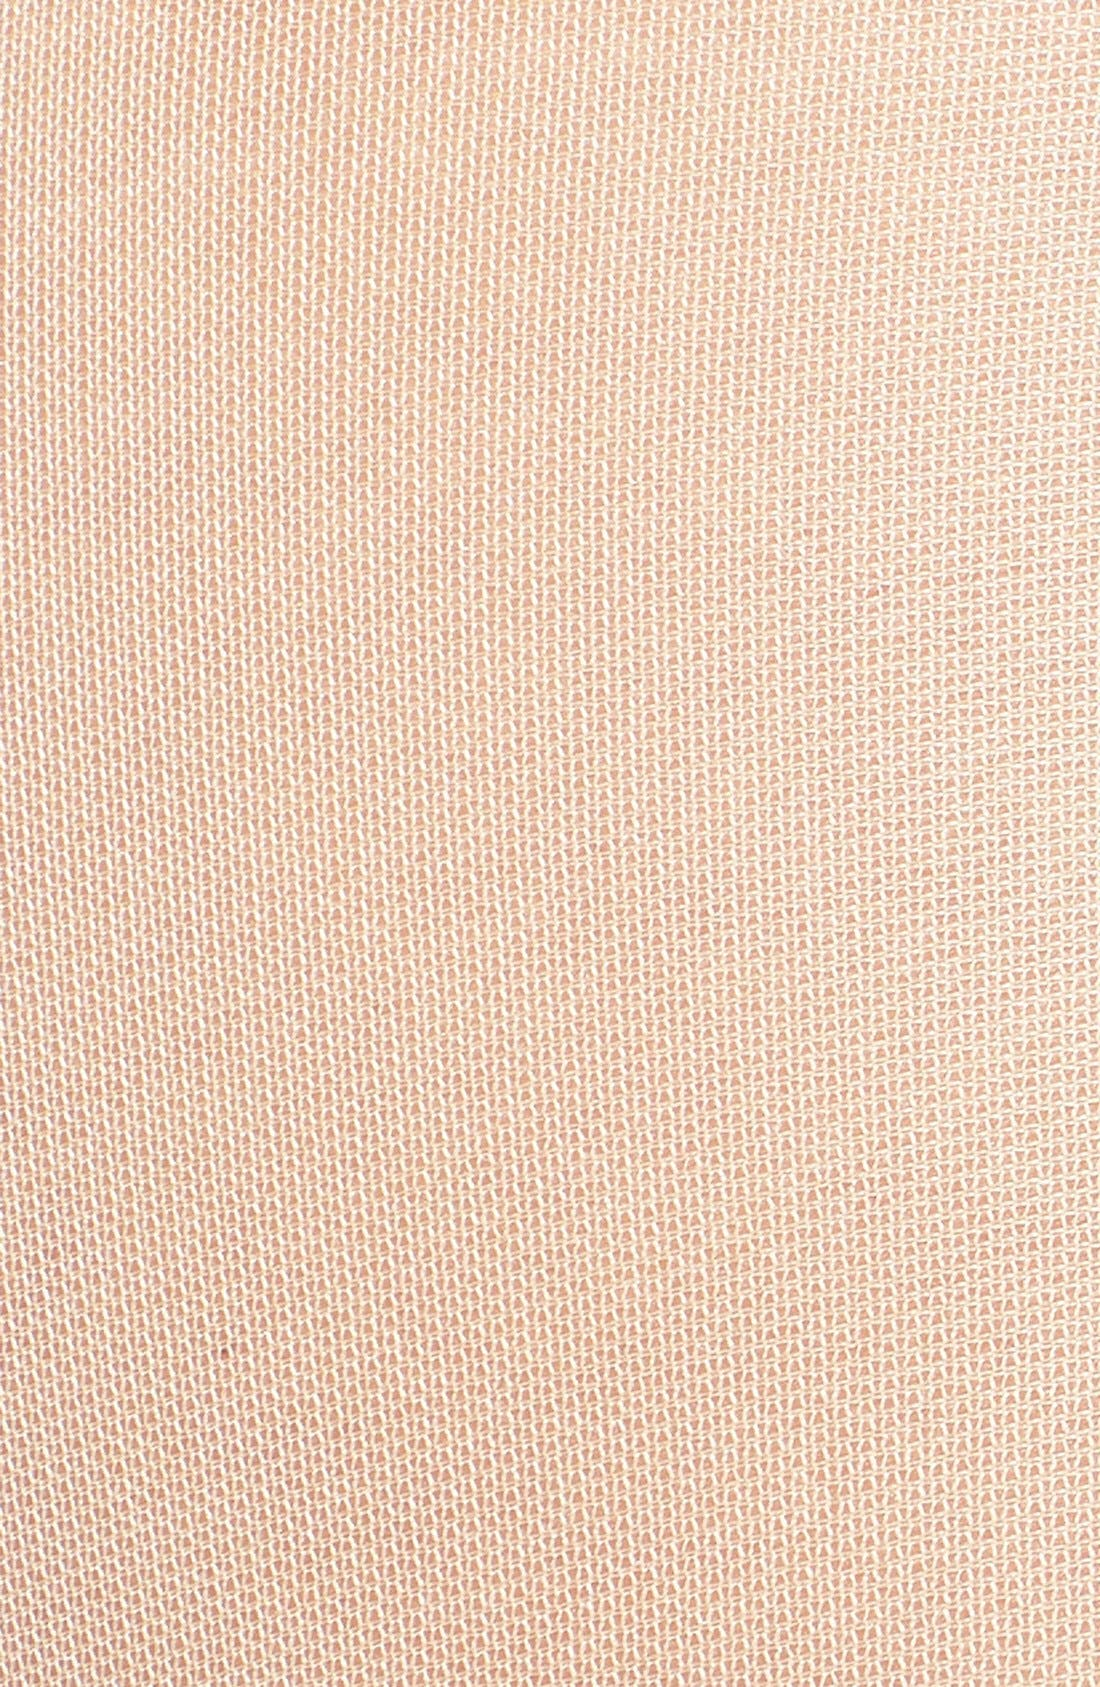 CALVIN KLEIN,                             'Sheer Essentials - Matte Ultra Sheer' Control Top Pantyhose,                             Alternate thumbnail 2, color,                             BUFF